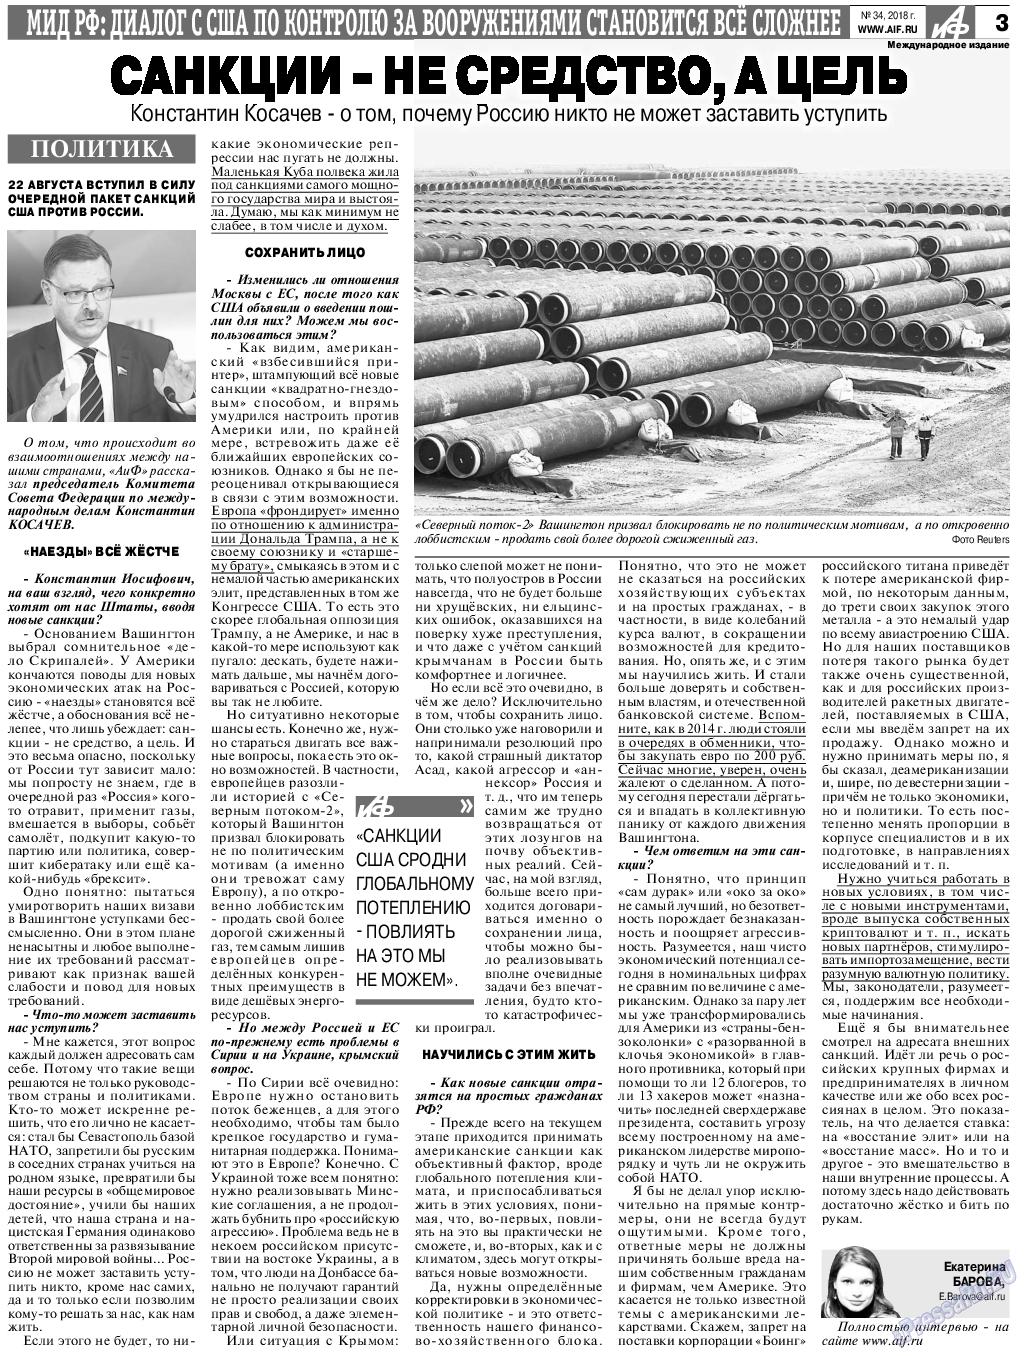 Аргументы и факты Европа (газета). 2018 год, номер 34, стр. 3